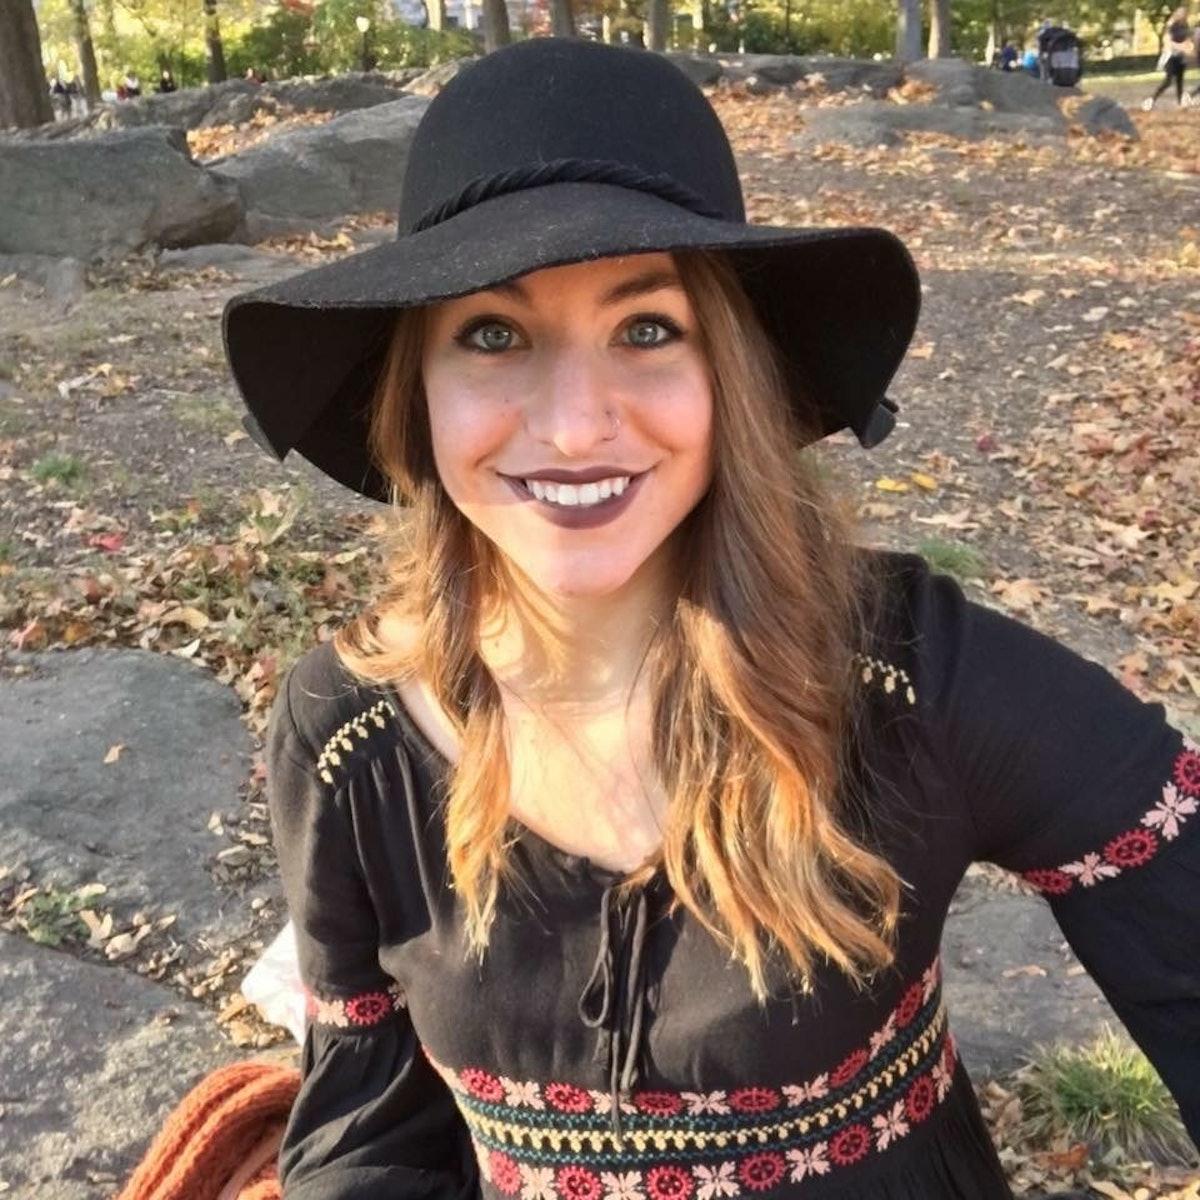 Samantha Driscoll